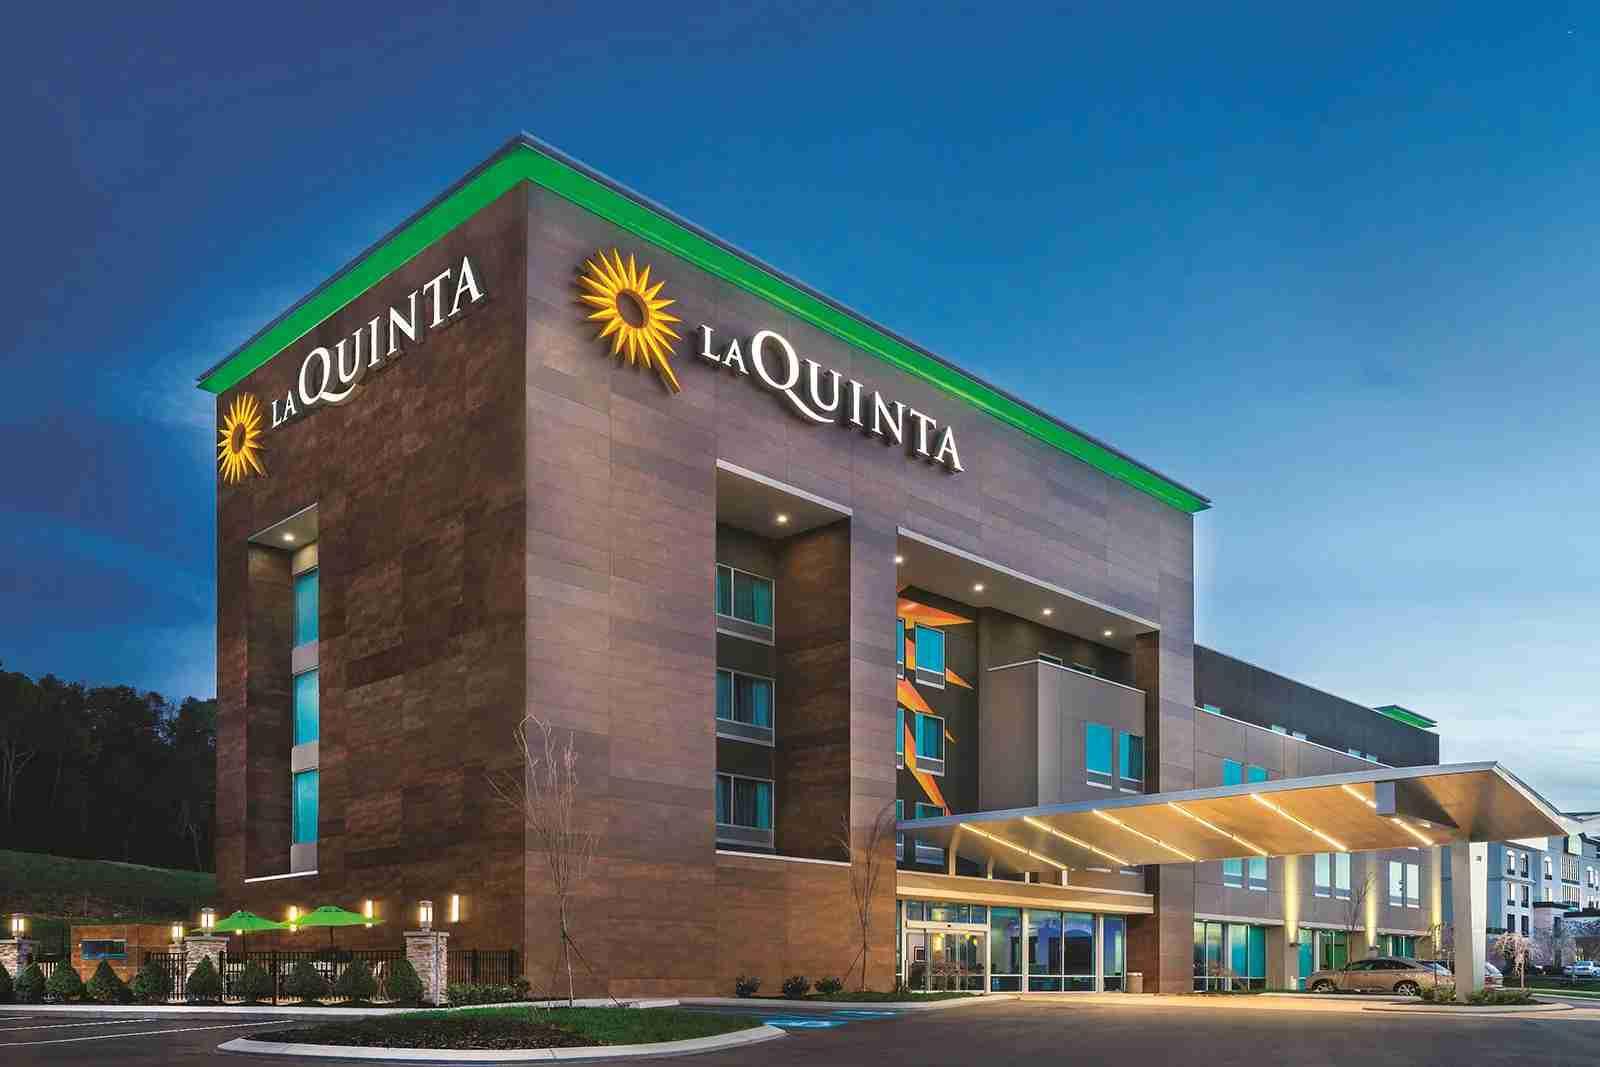 La Quinta by Wyndham Cleveland, Tennessee (Wyndham award chart change)